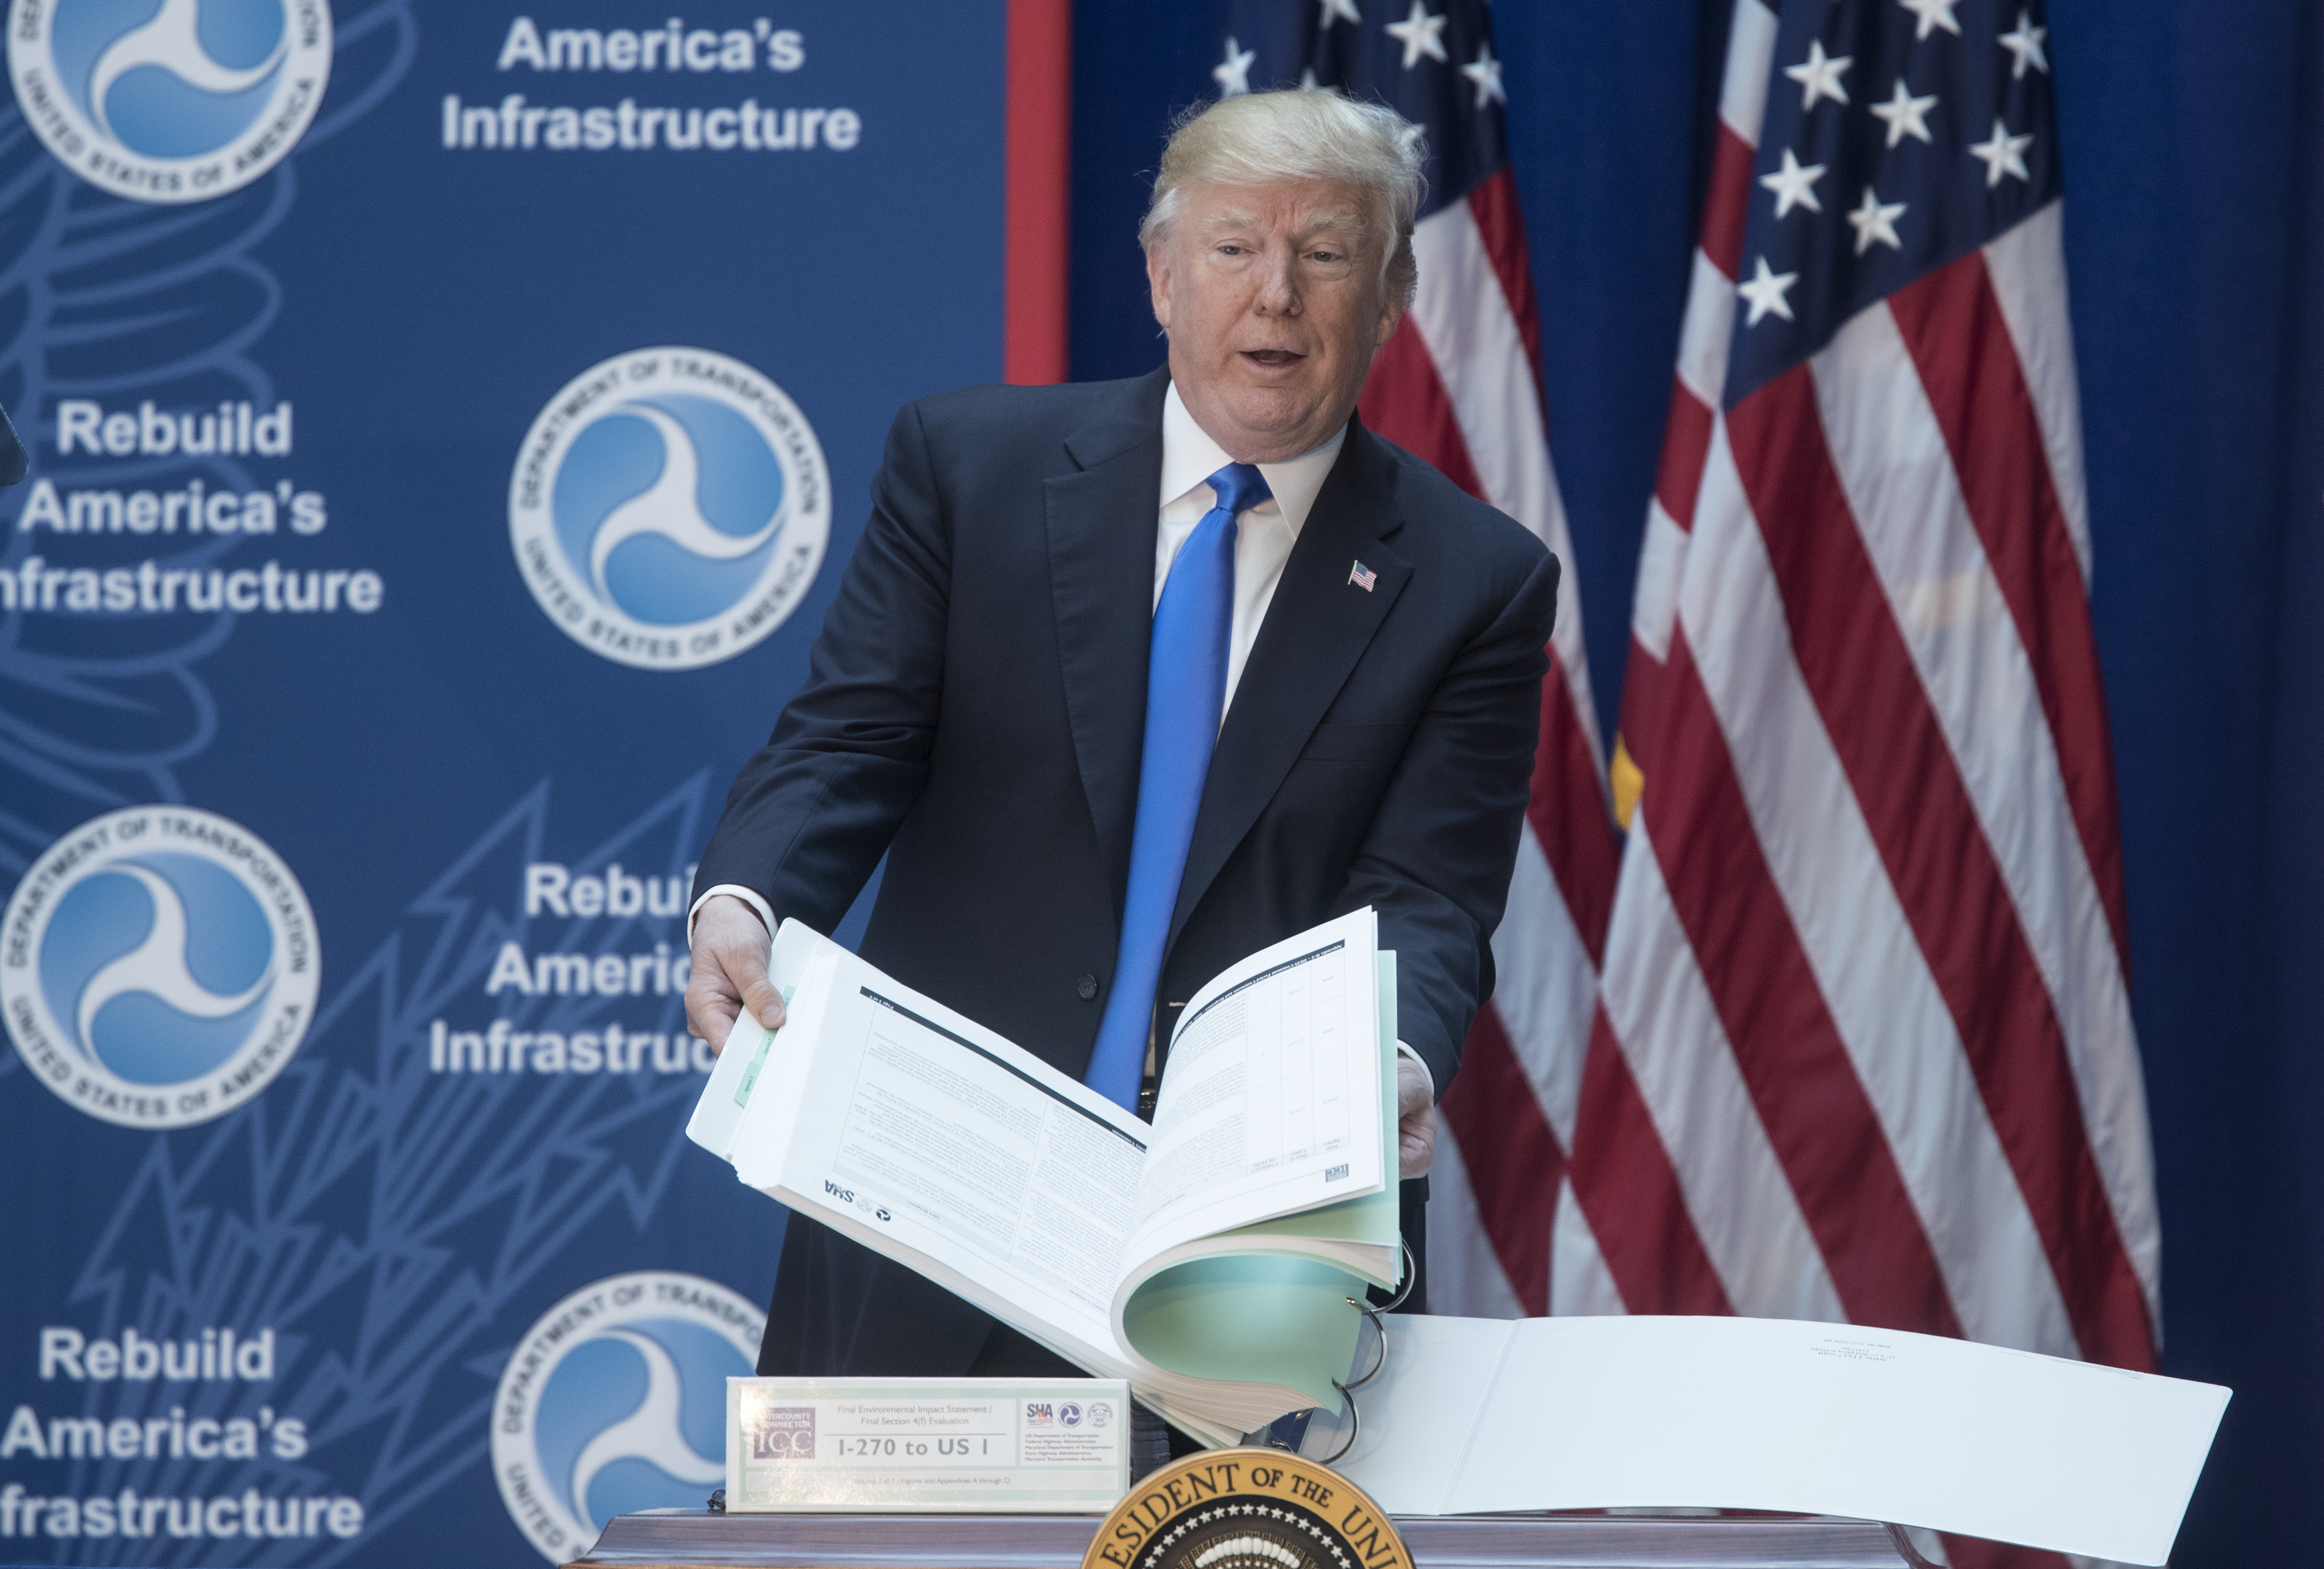 President Trump Speaks At The Department Of Transportation